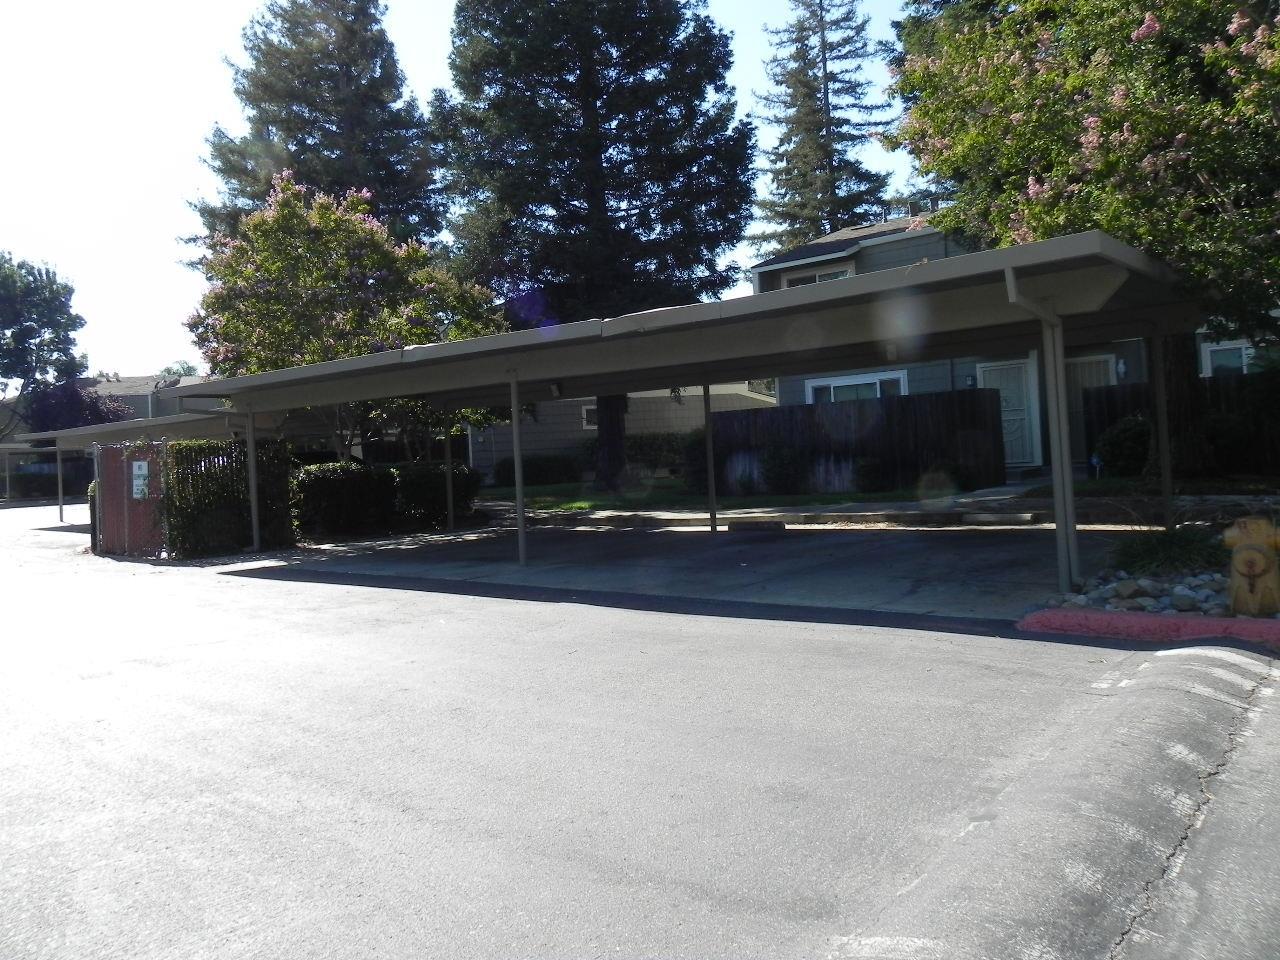 Townhouse for Sale at 18210 Hale Avenue 18210 Hale Avenue Morgan Hill, California 95037 United States